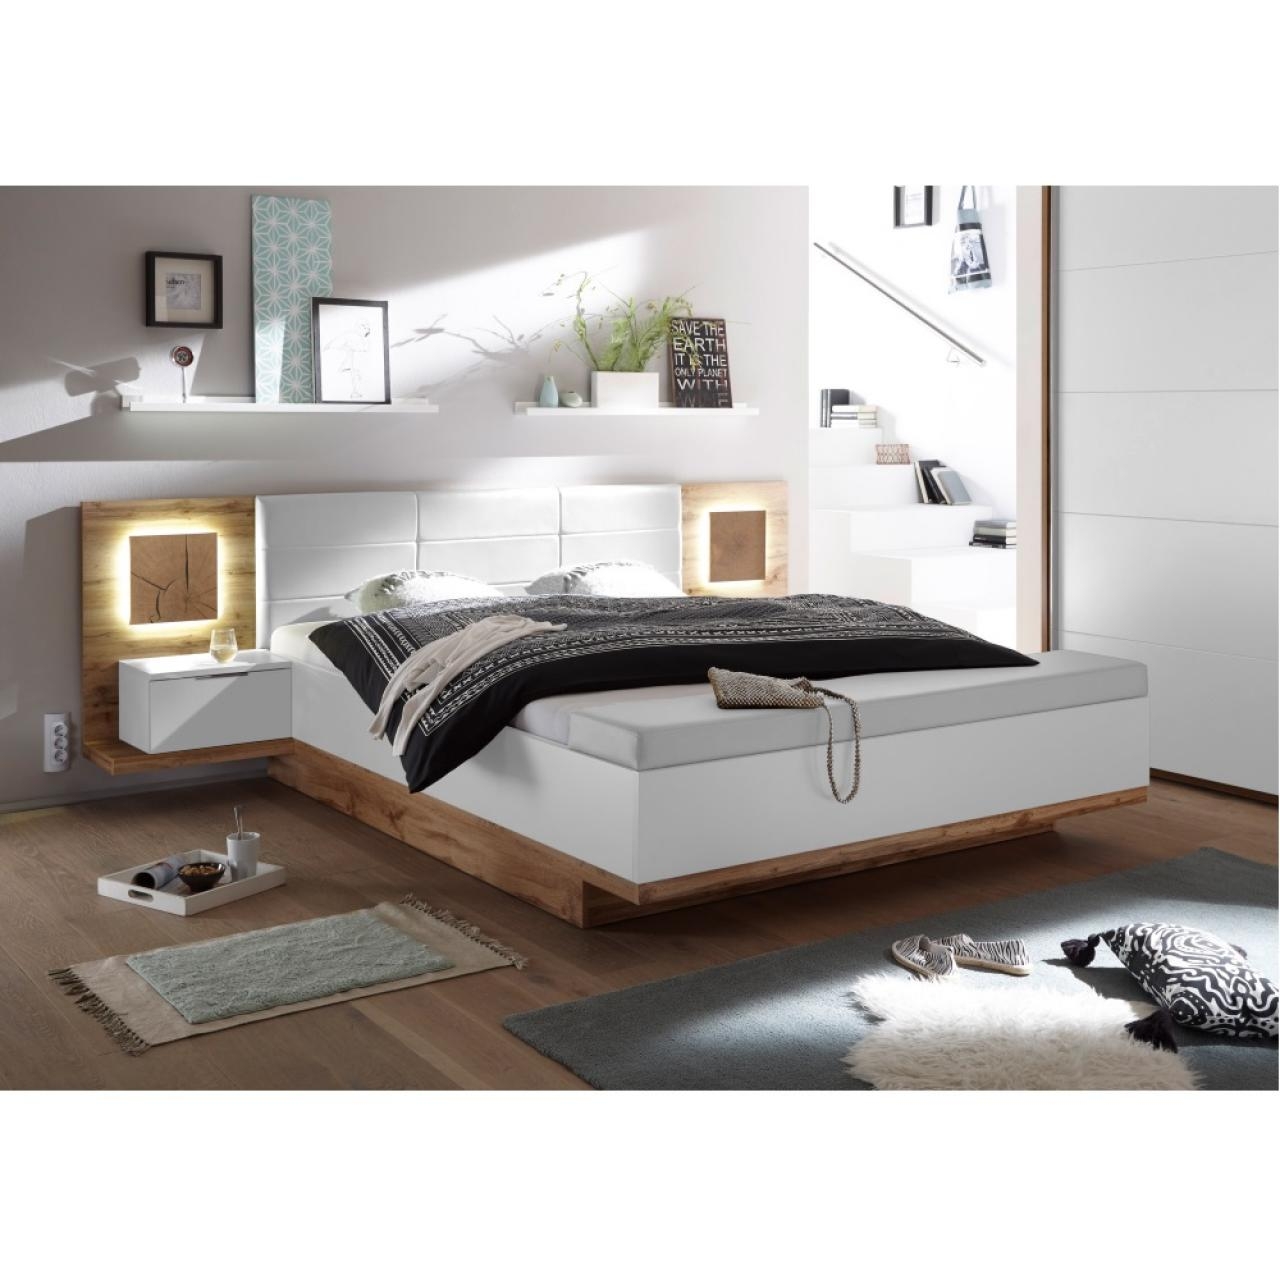 Bett Capri mit Nachtkommode und Bank/Truhe